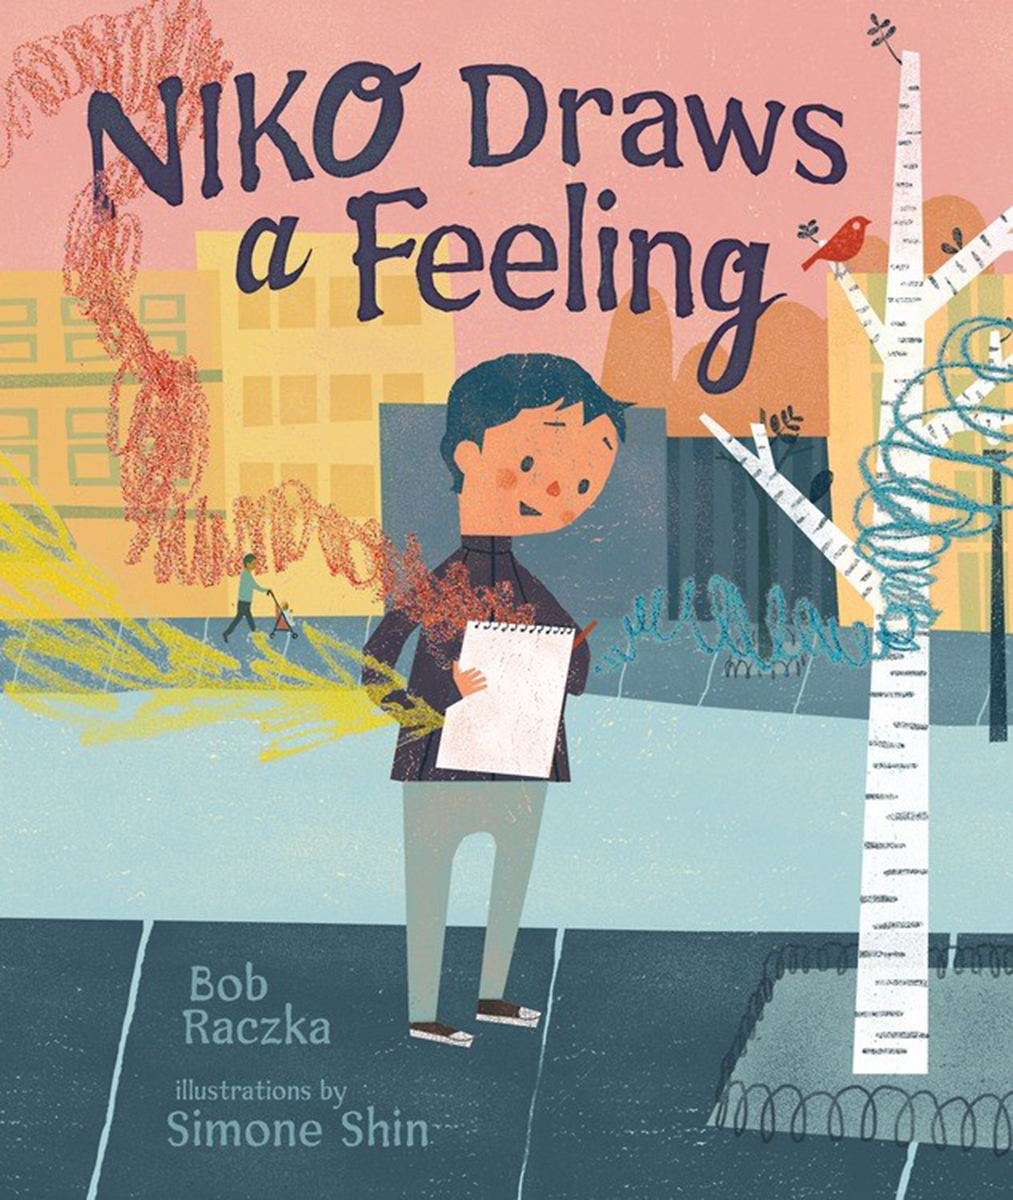 Niko Draws a Feeling, by Bob Raczka and Simone Shin